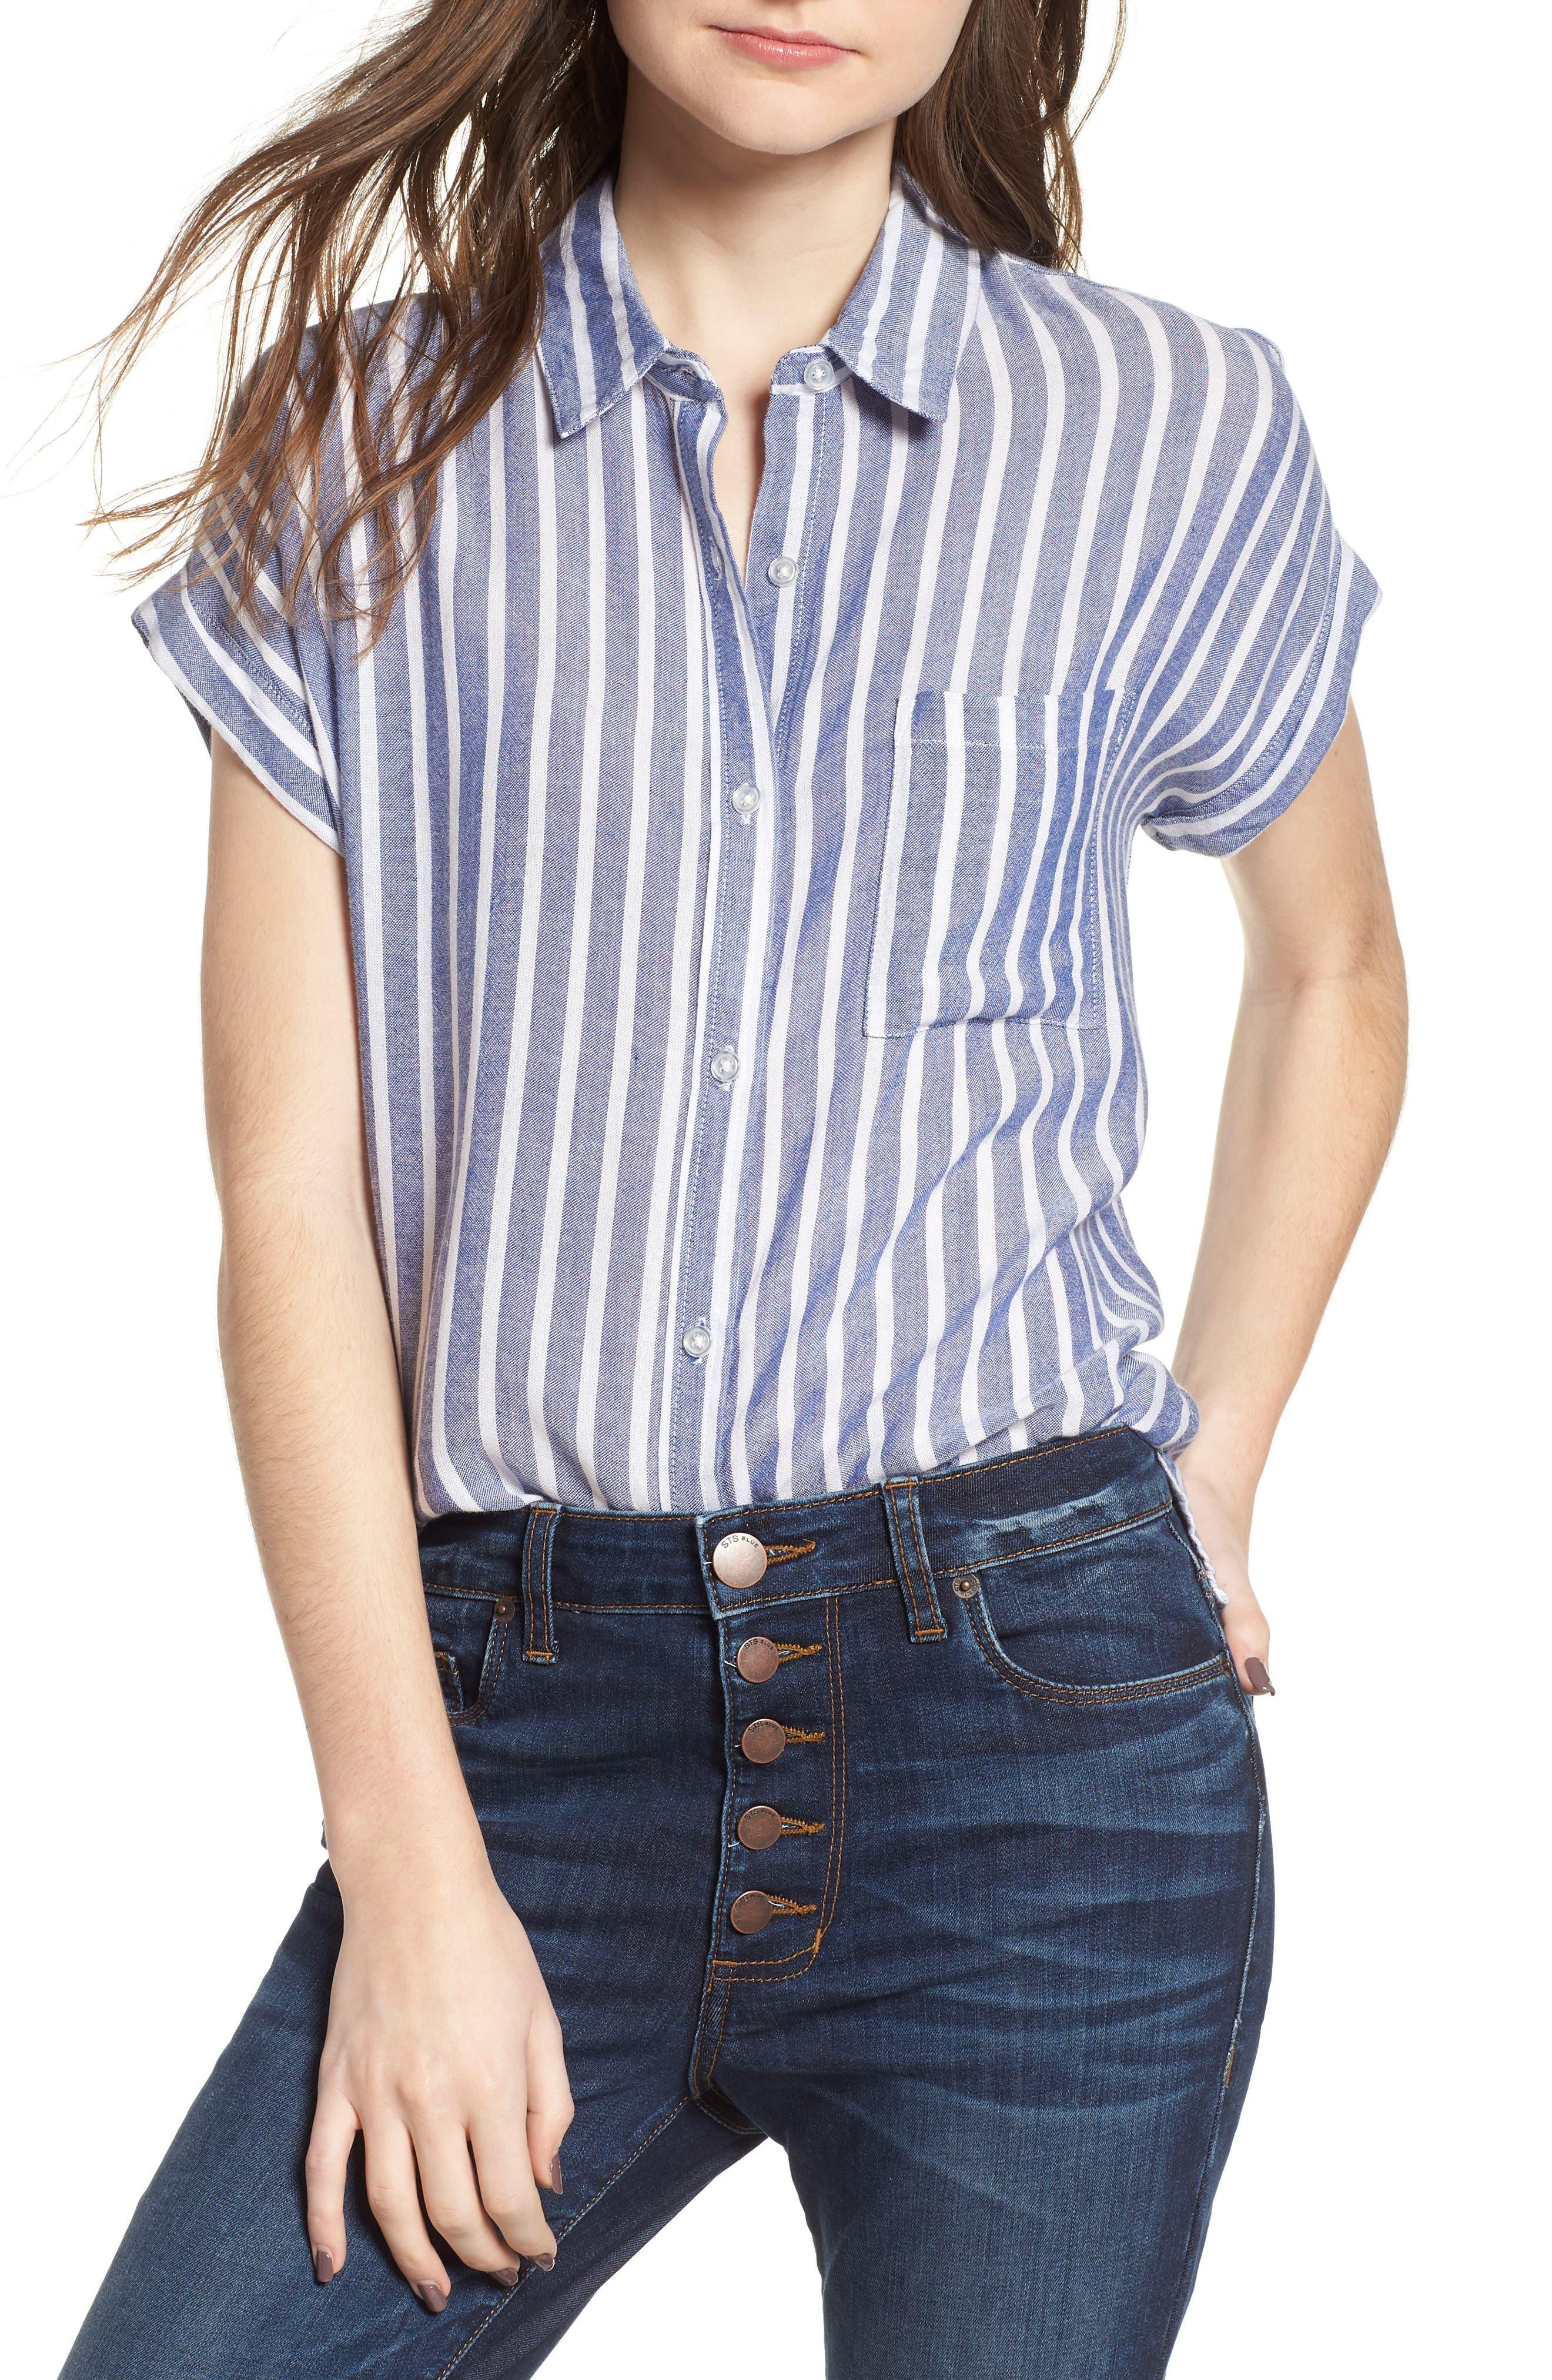 Main Image - Thread & Supply Benji Stripe Shirt